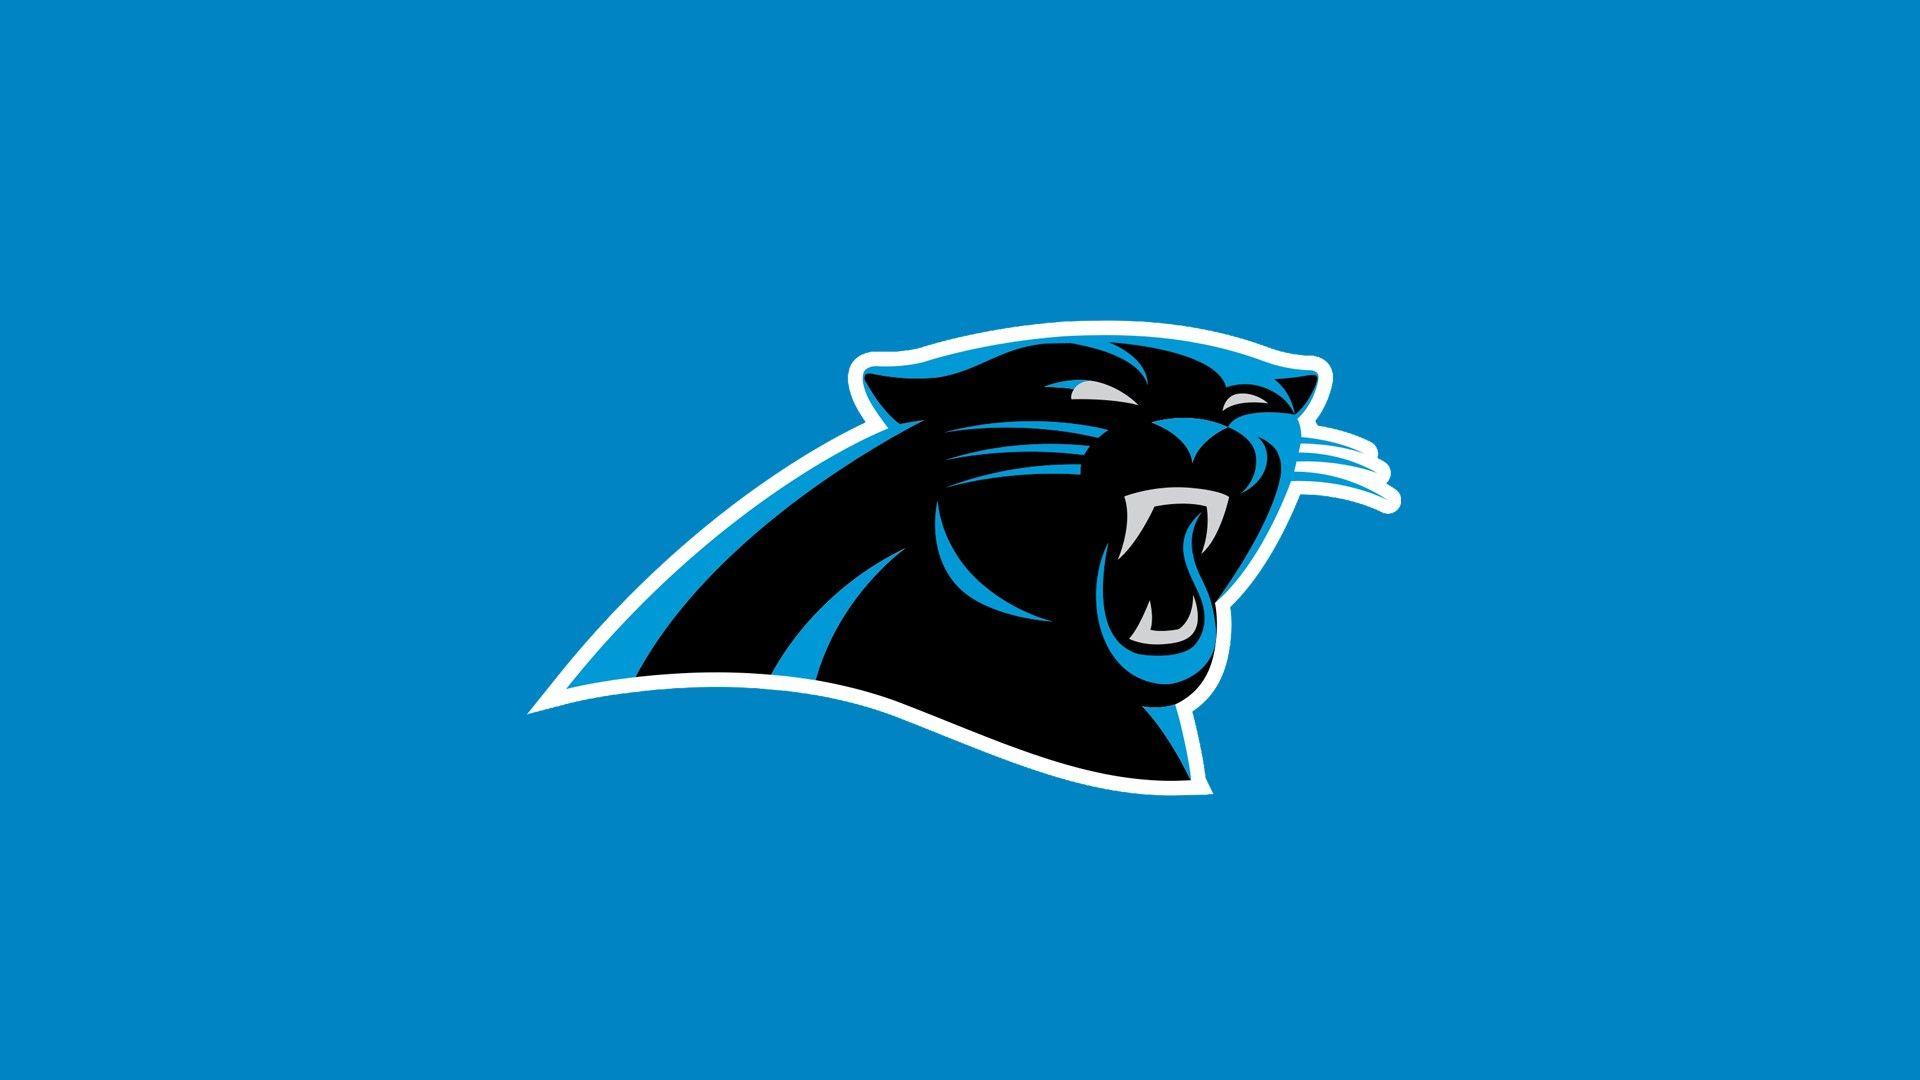 Carolina Panthers Backgrounds Hd 2021 Nfl Football Wallpapers Carolina Panthers Wallpaper Carolina Panthers Logo Carolina Panthers Logo Wallpapers